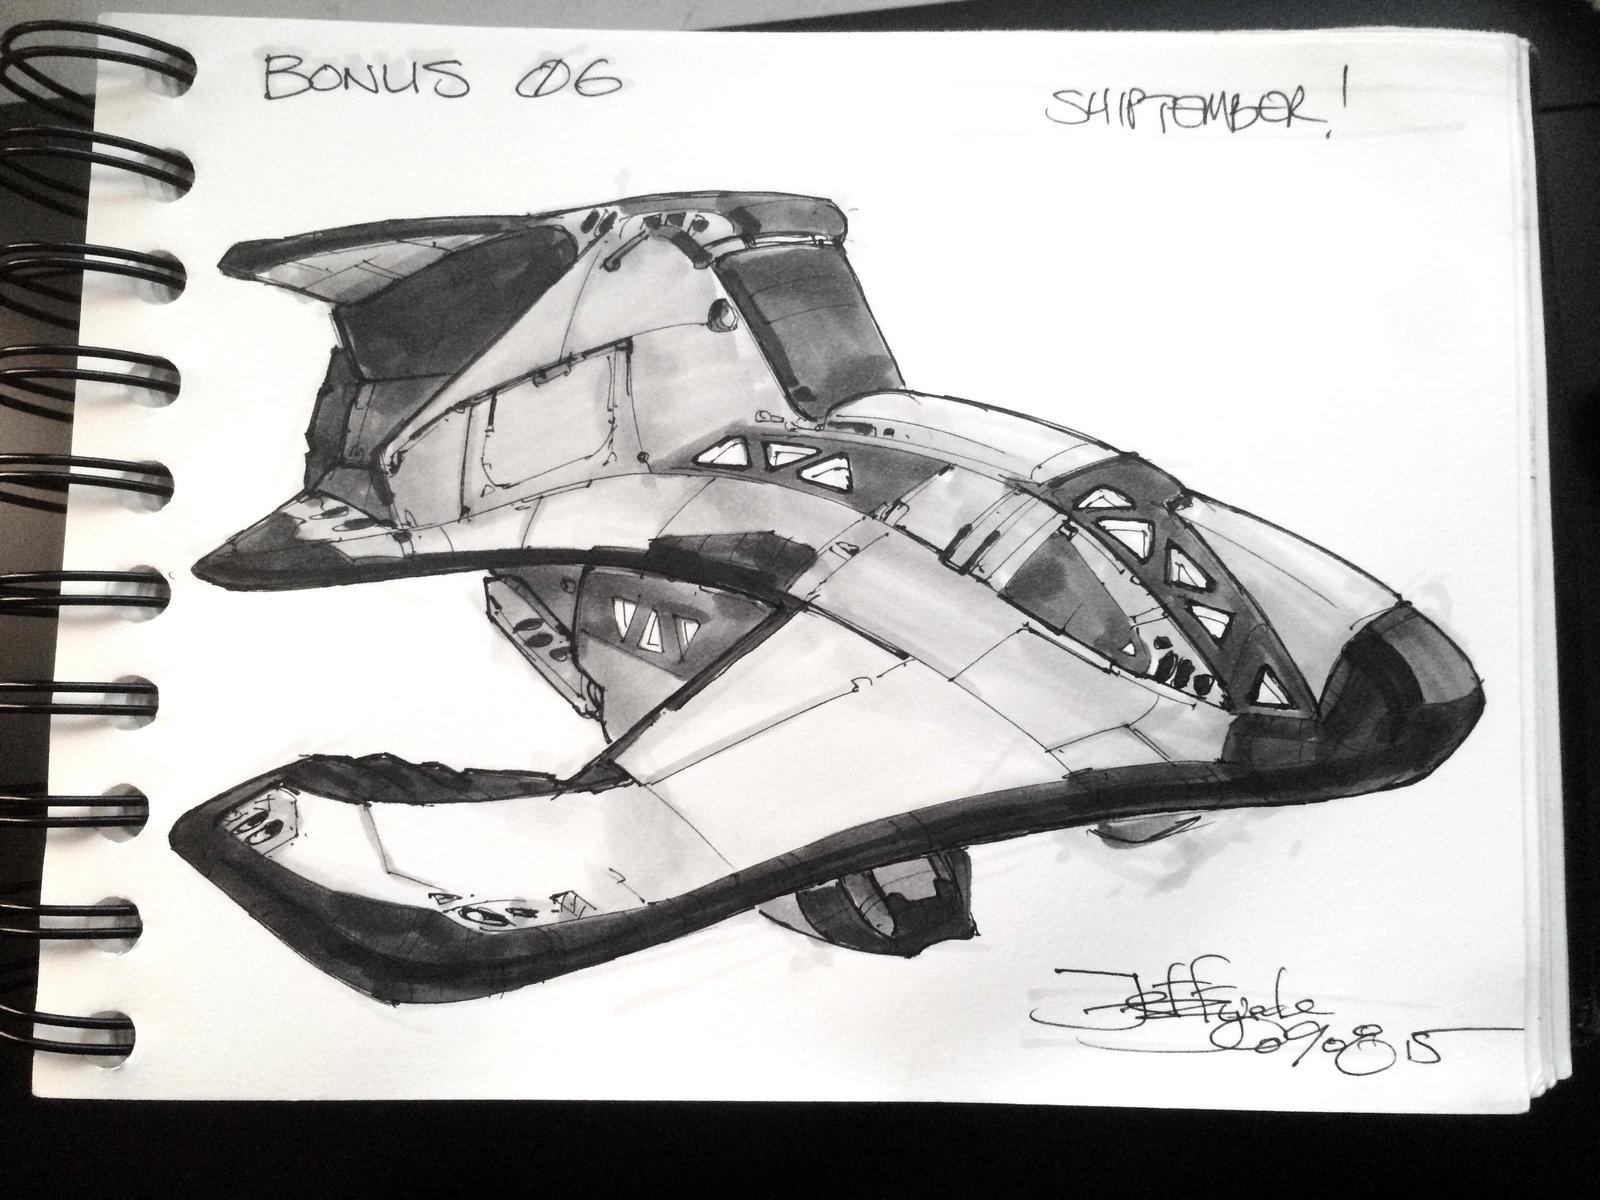 Shiptember Bonus 06